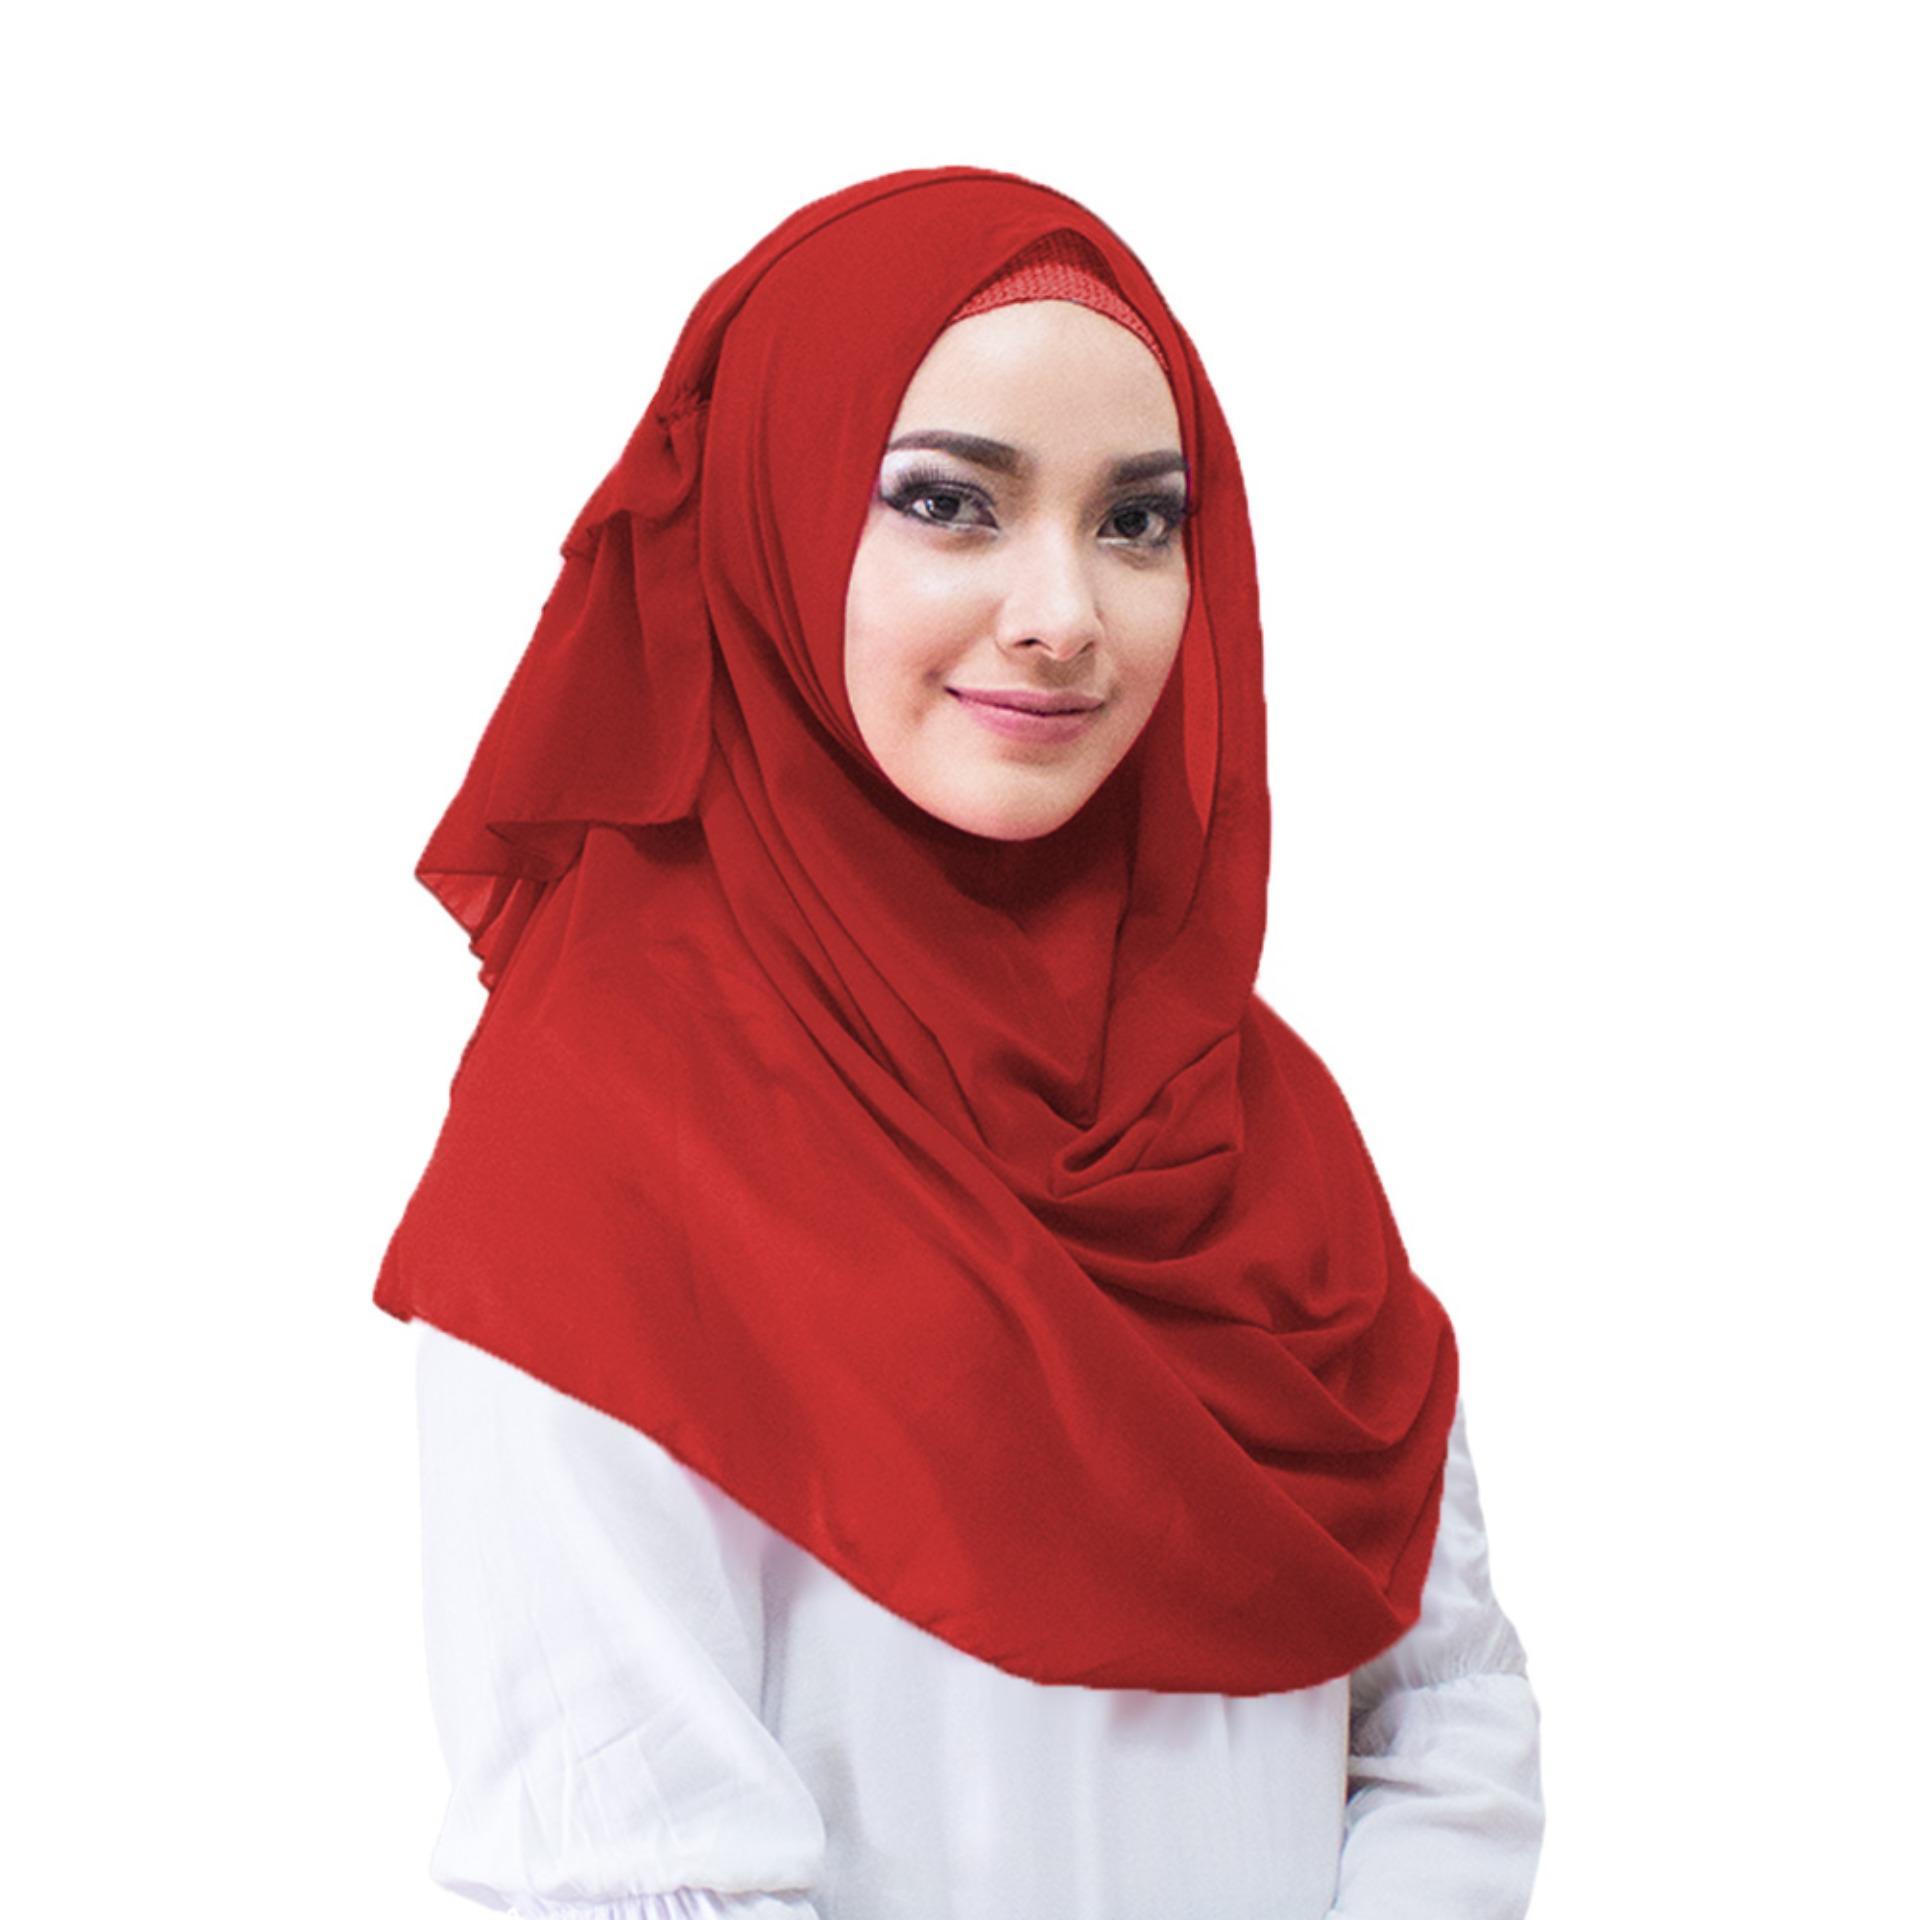 Produk Diskon Terlaris Wolfis Monalisa Jilbab Instan Kerudung Nbsp Aime Hijab Instant Warna Merah